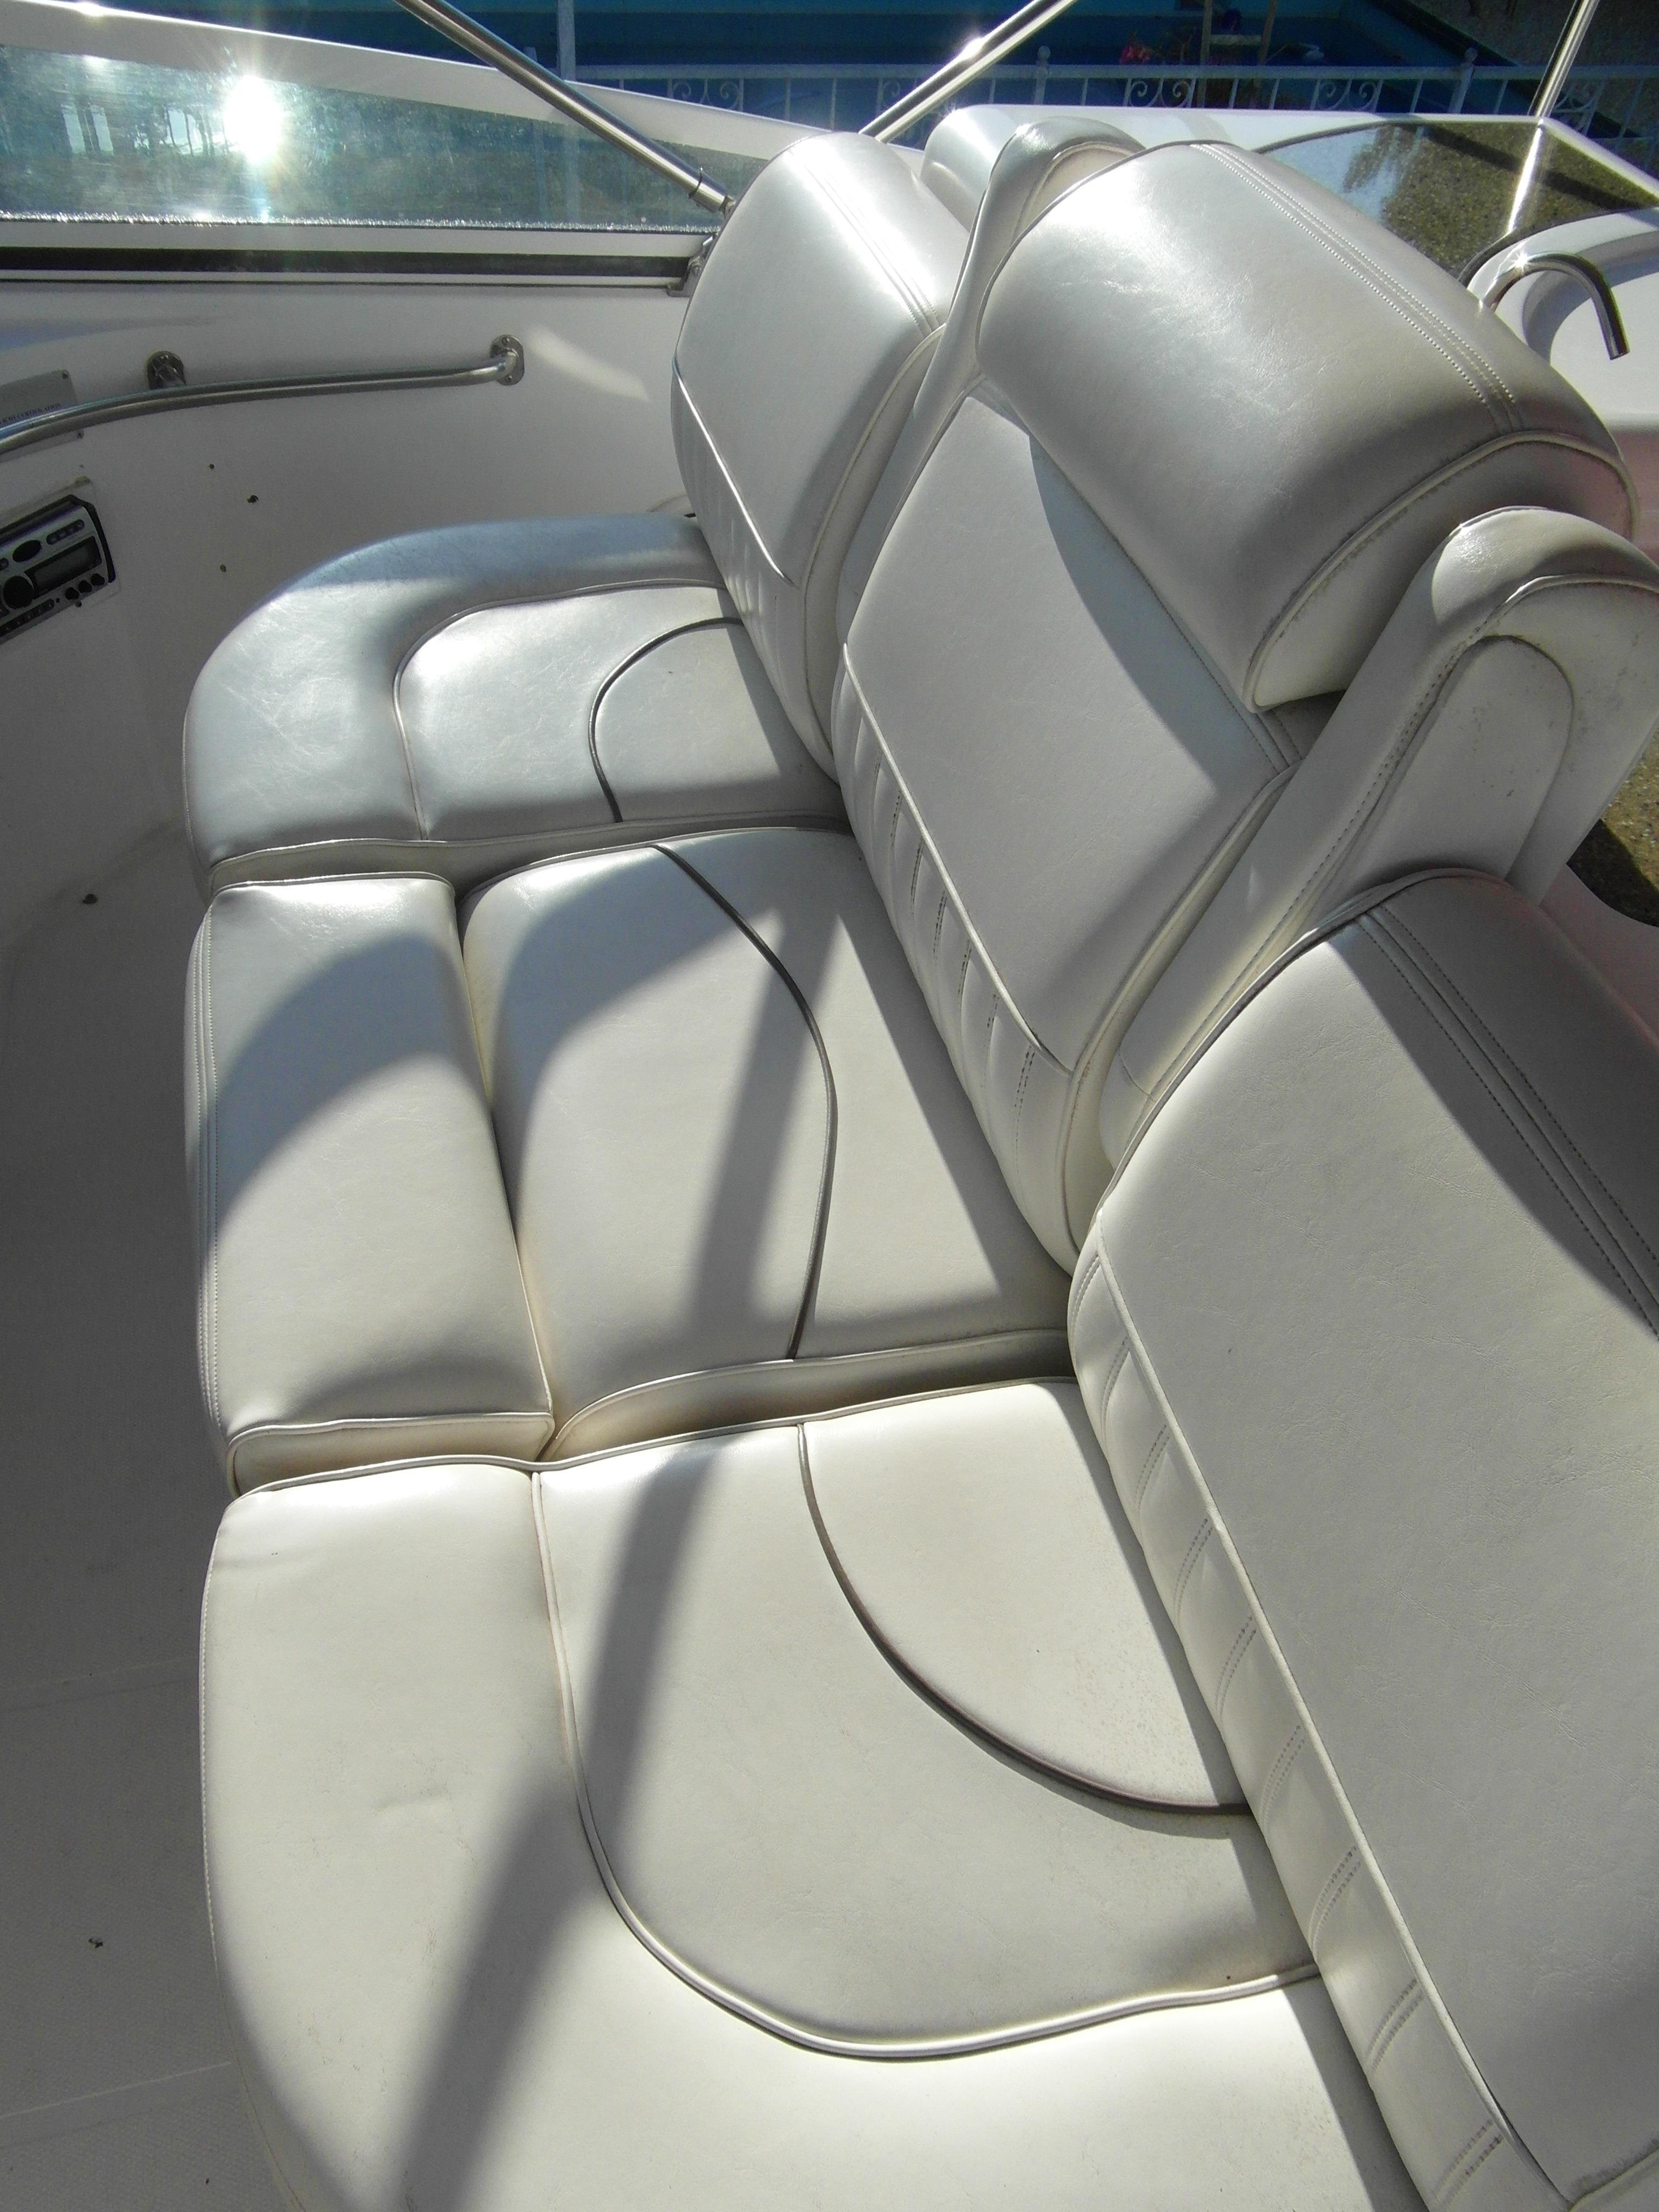 2001 Cruisers 50 Helm Seating